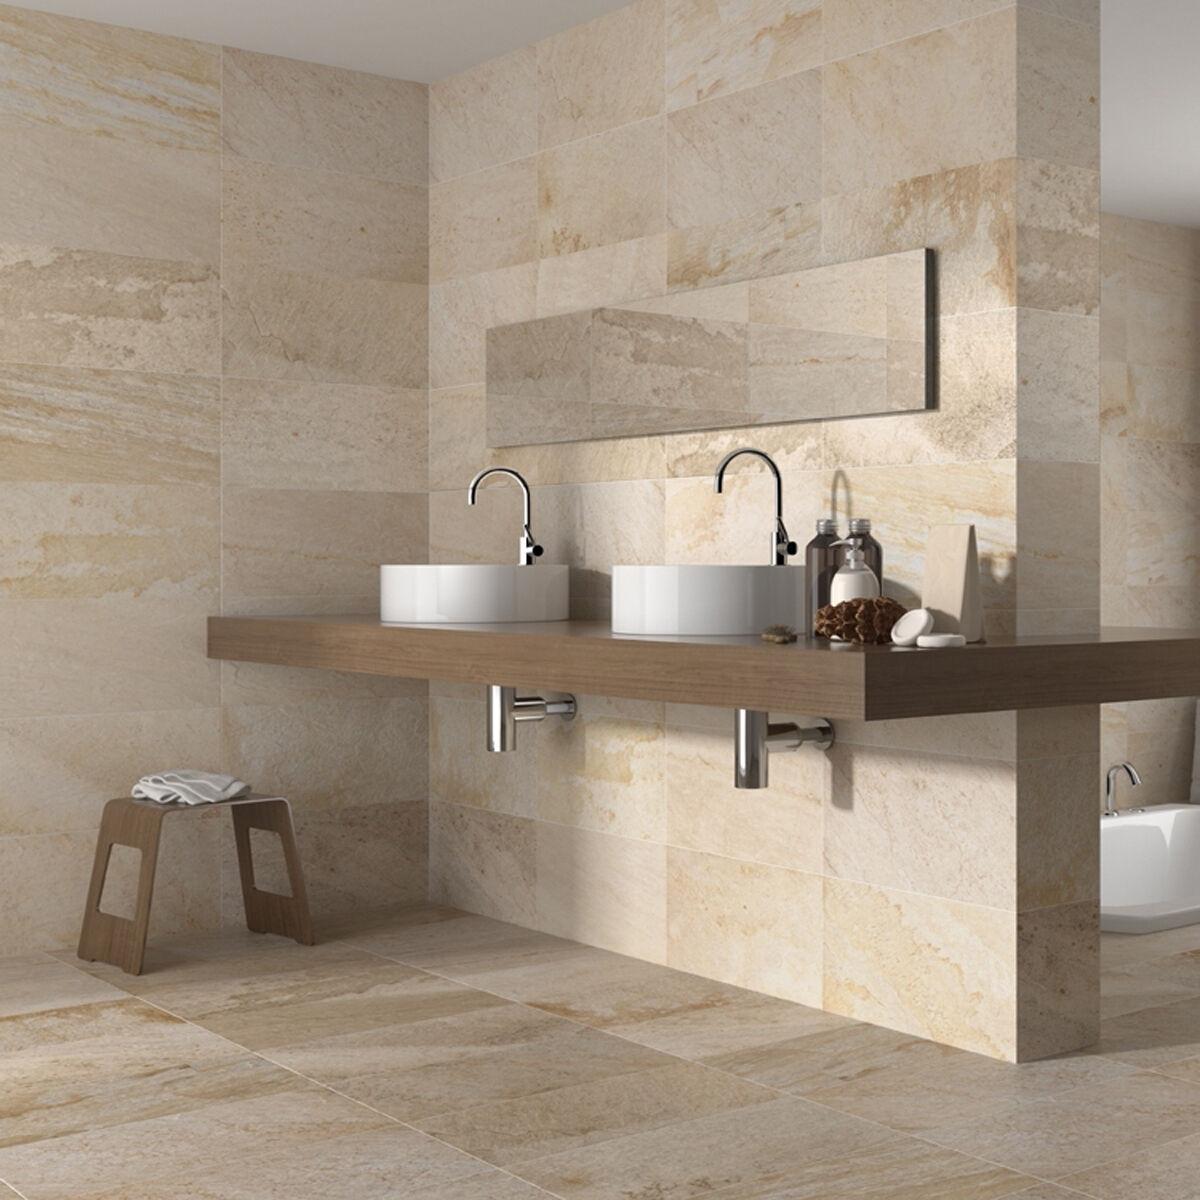 50x27 Matt Cream Stone Effect Ceramic Wall And Floor Tiles 1 Sqm 7 4tiles